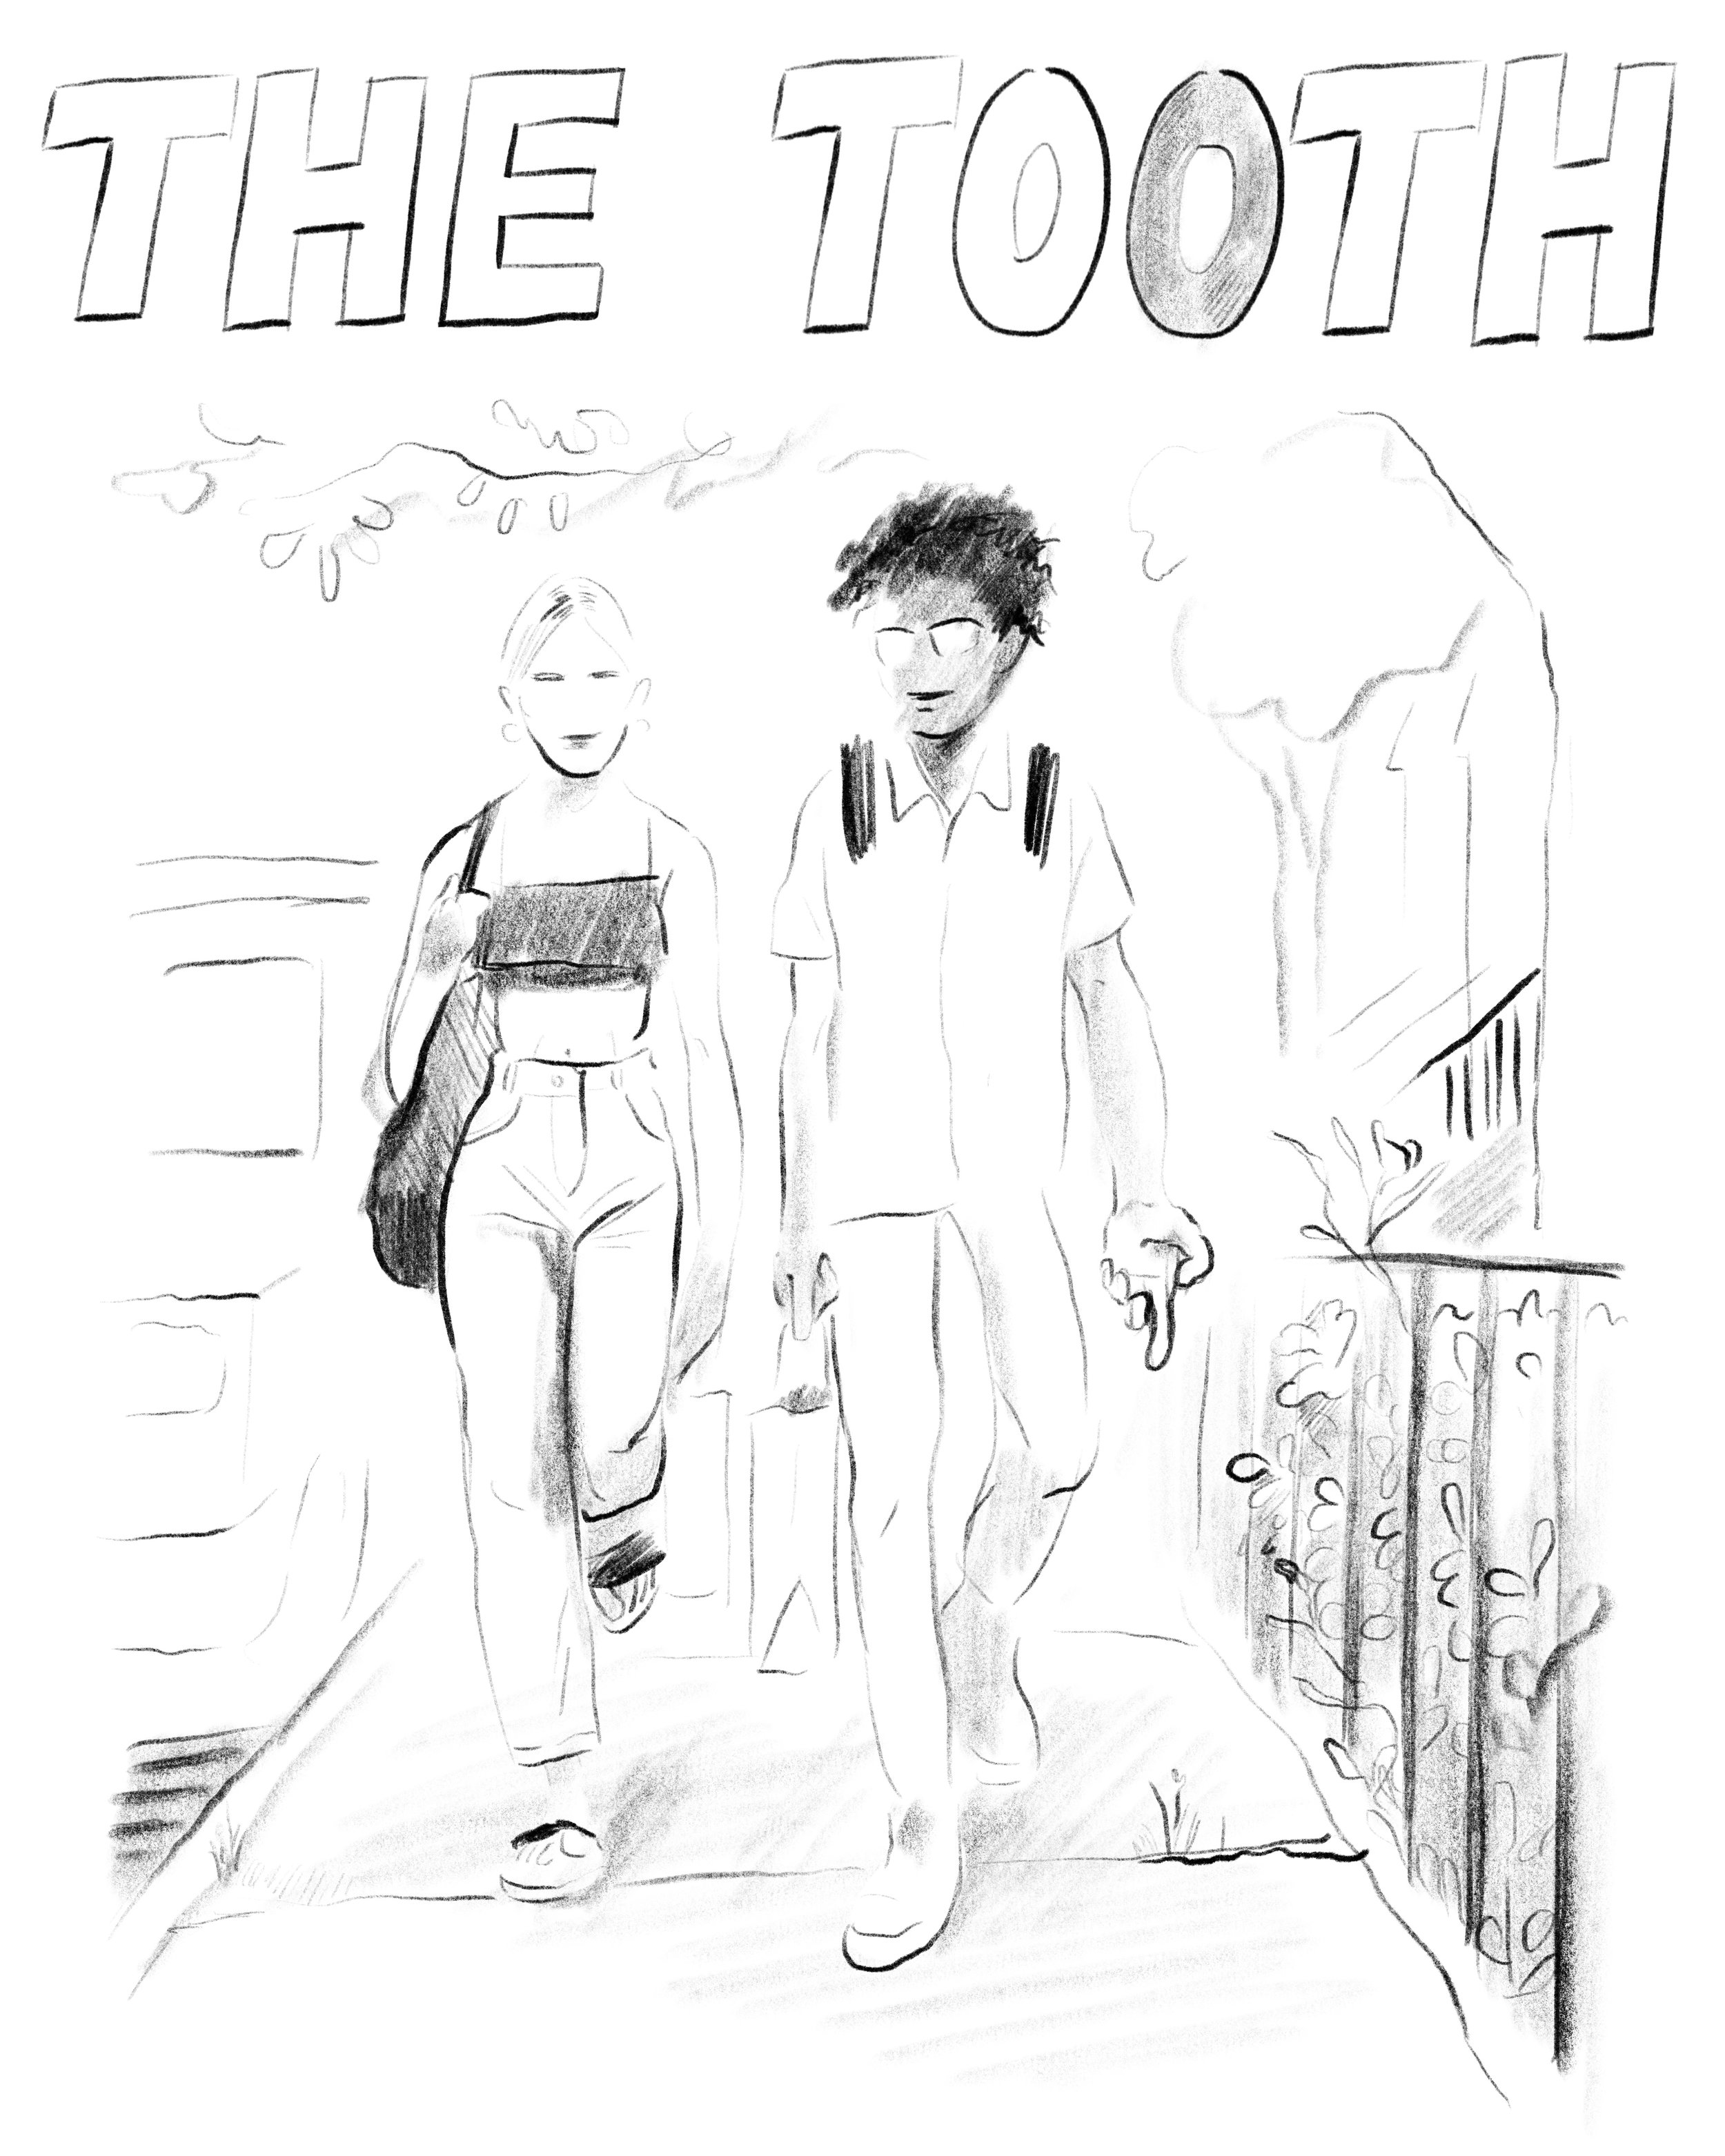 thetooth_01.jpg